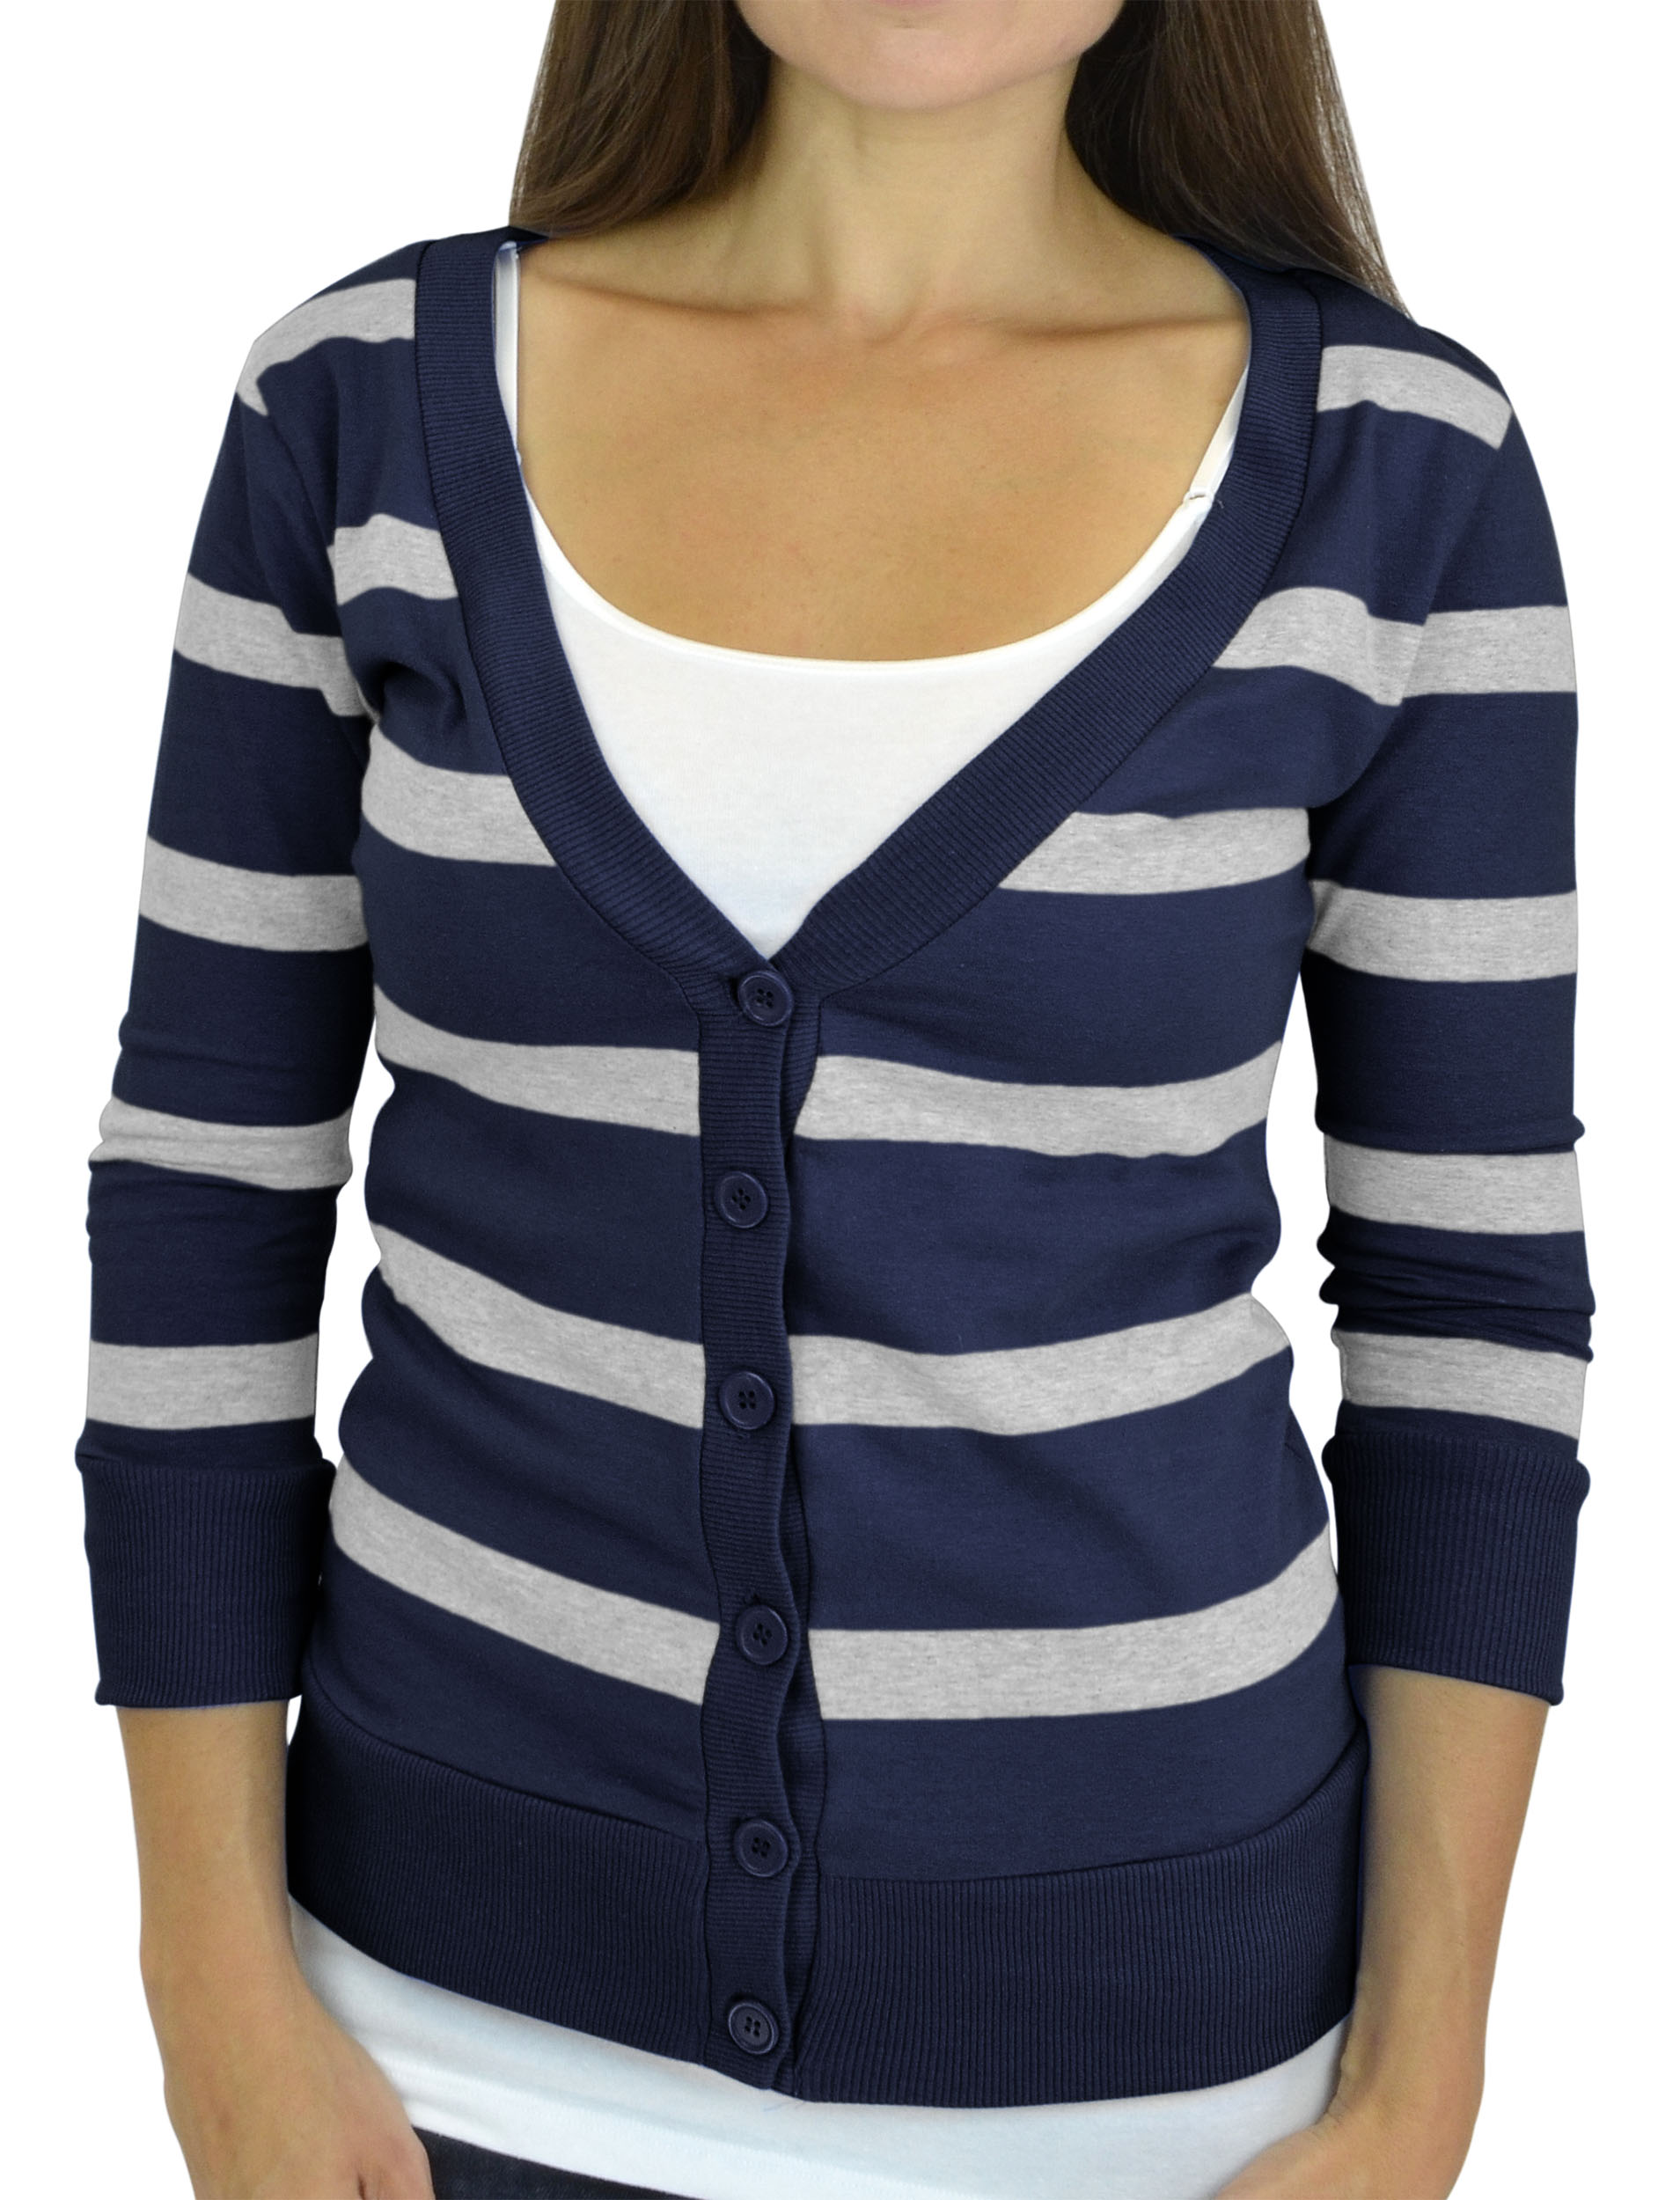 Belle Donne - Women / Girl Junior Size Soft 3/4 Sleeve V-Neck Sweater Cardigans - Navy/Small